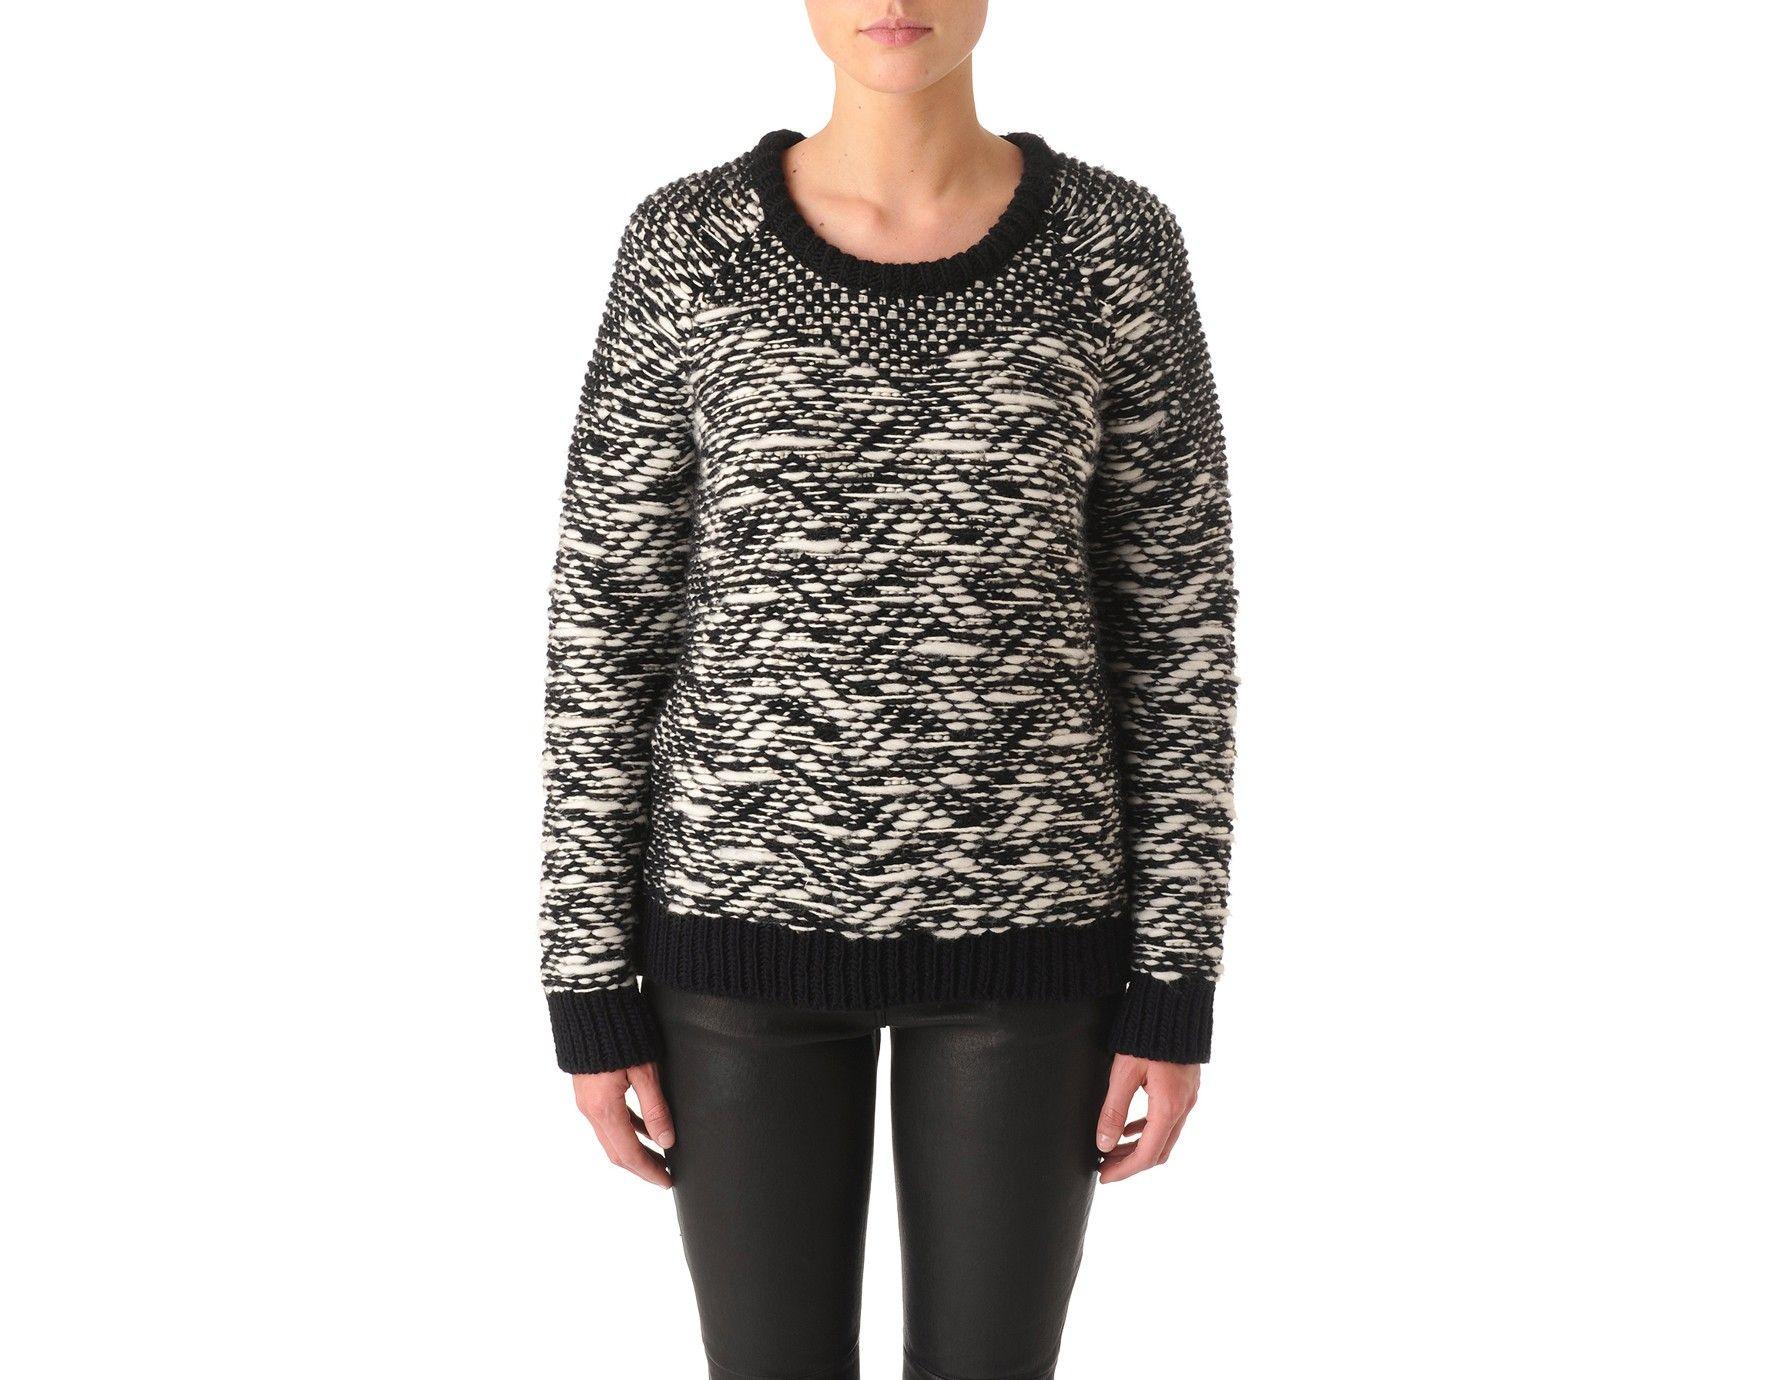 Caterina Sweater - Black and white sweat - Black - Sweaters ...